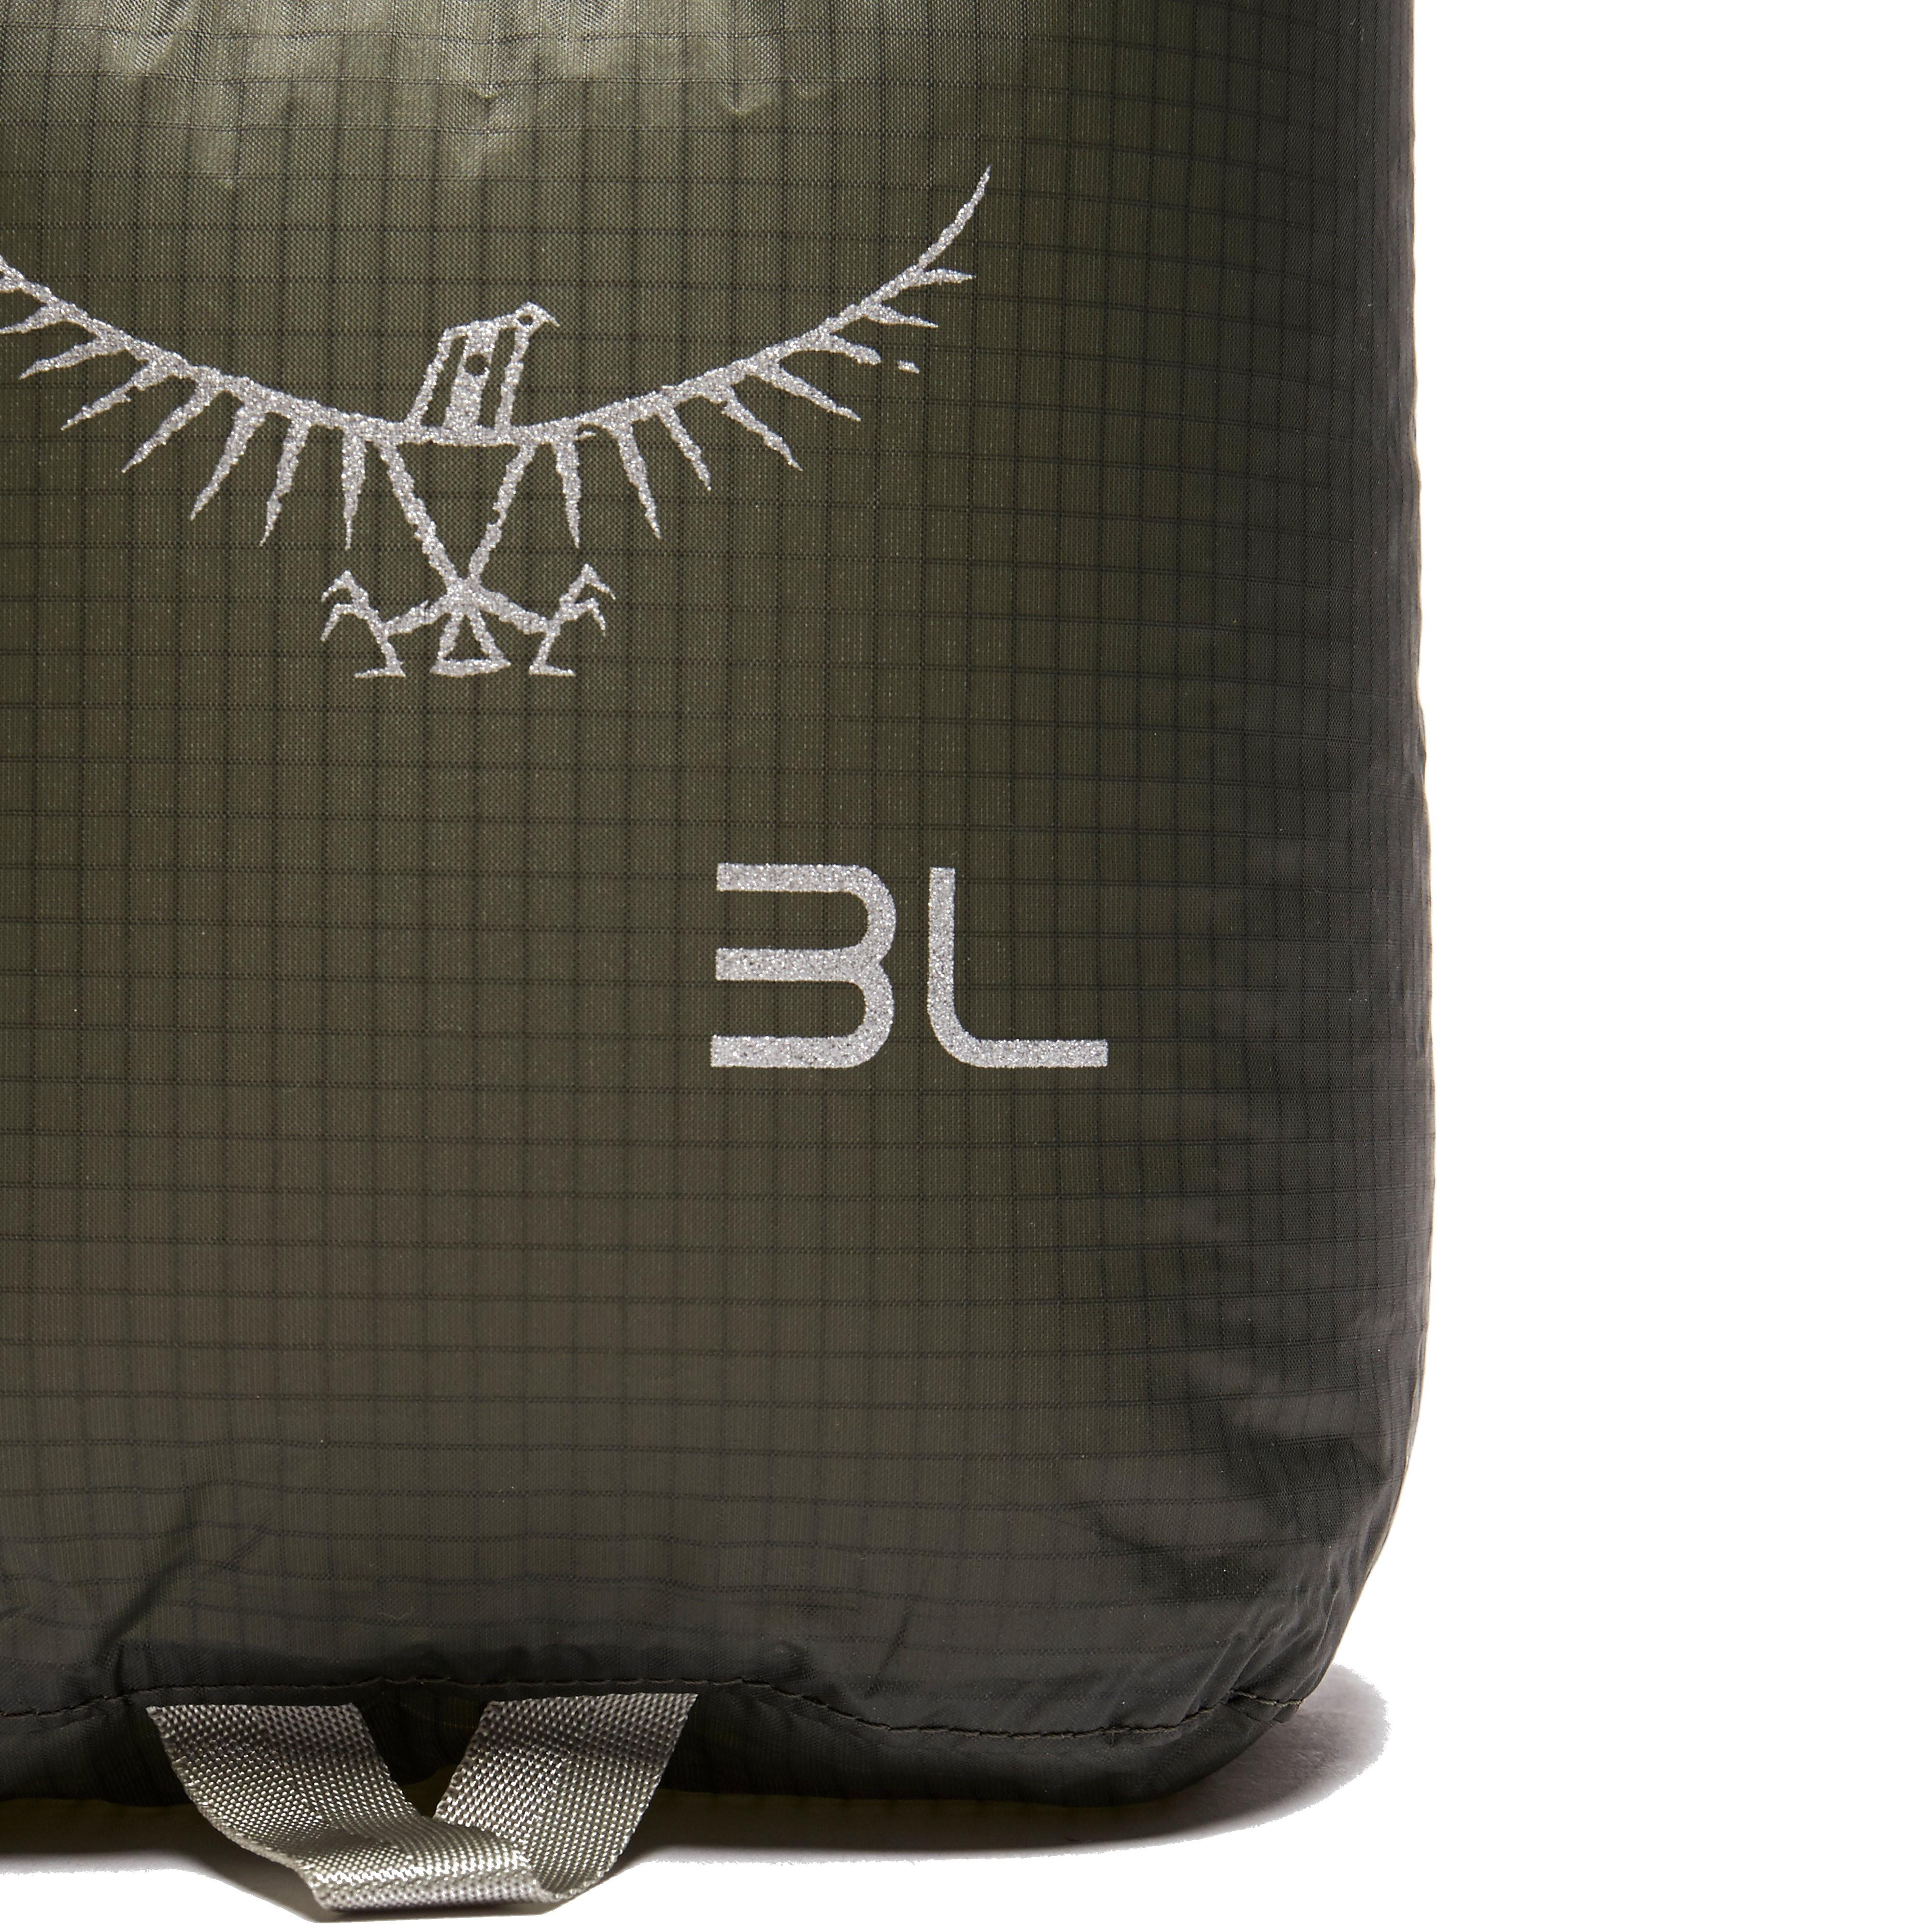 Osprey Ultralight Drysack 3